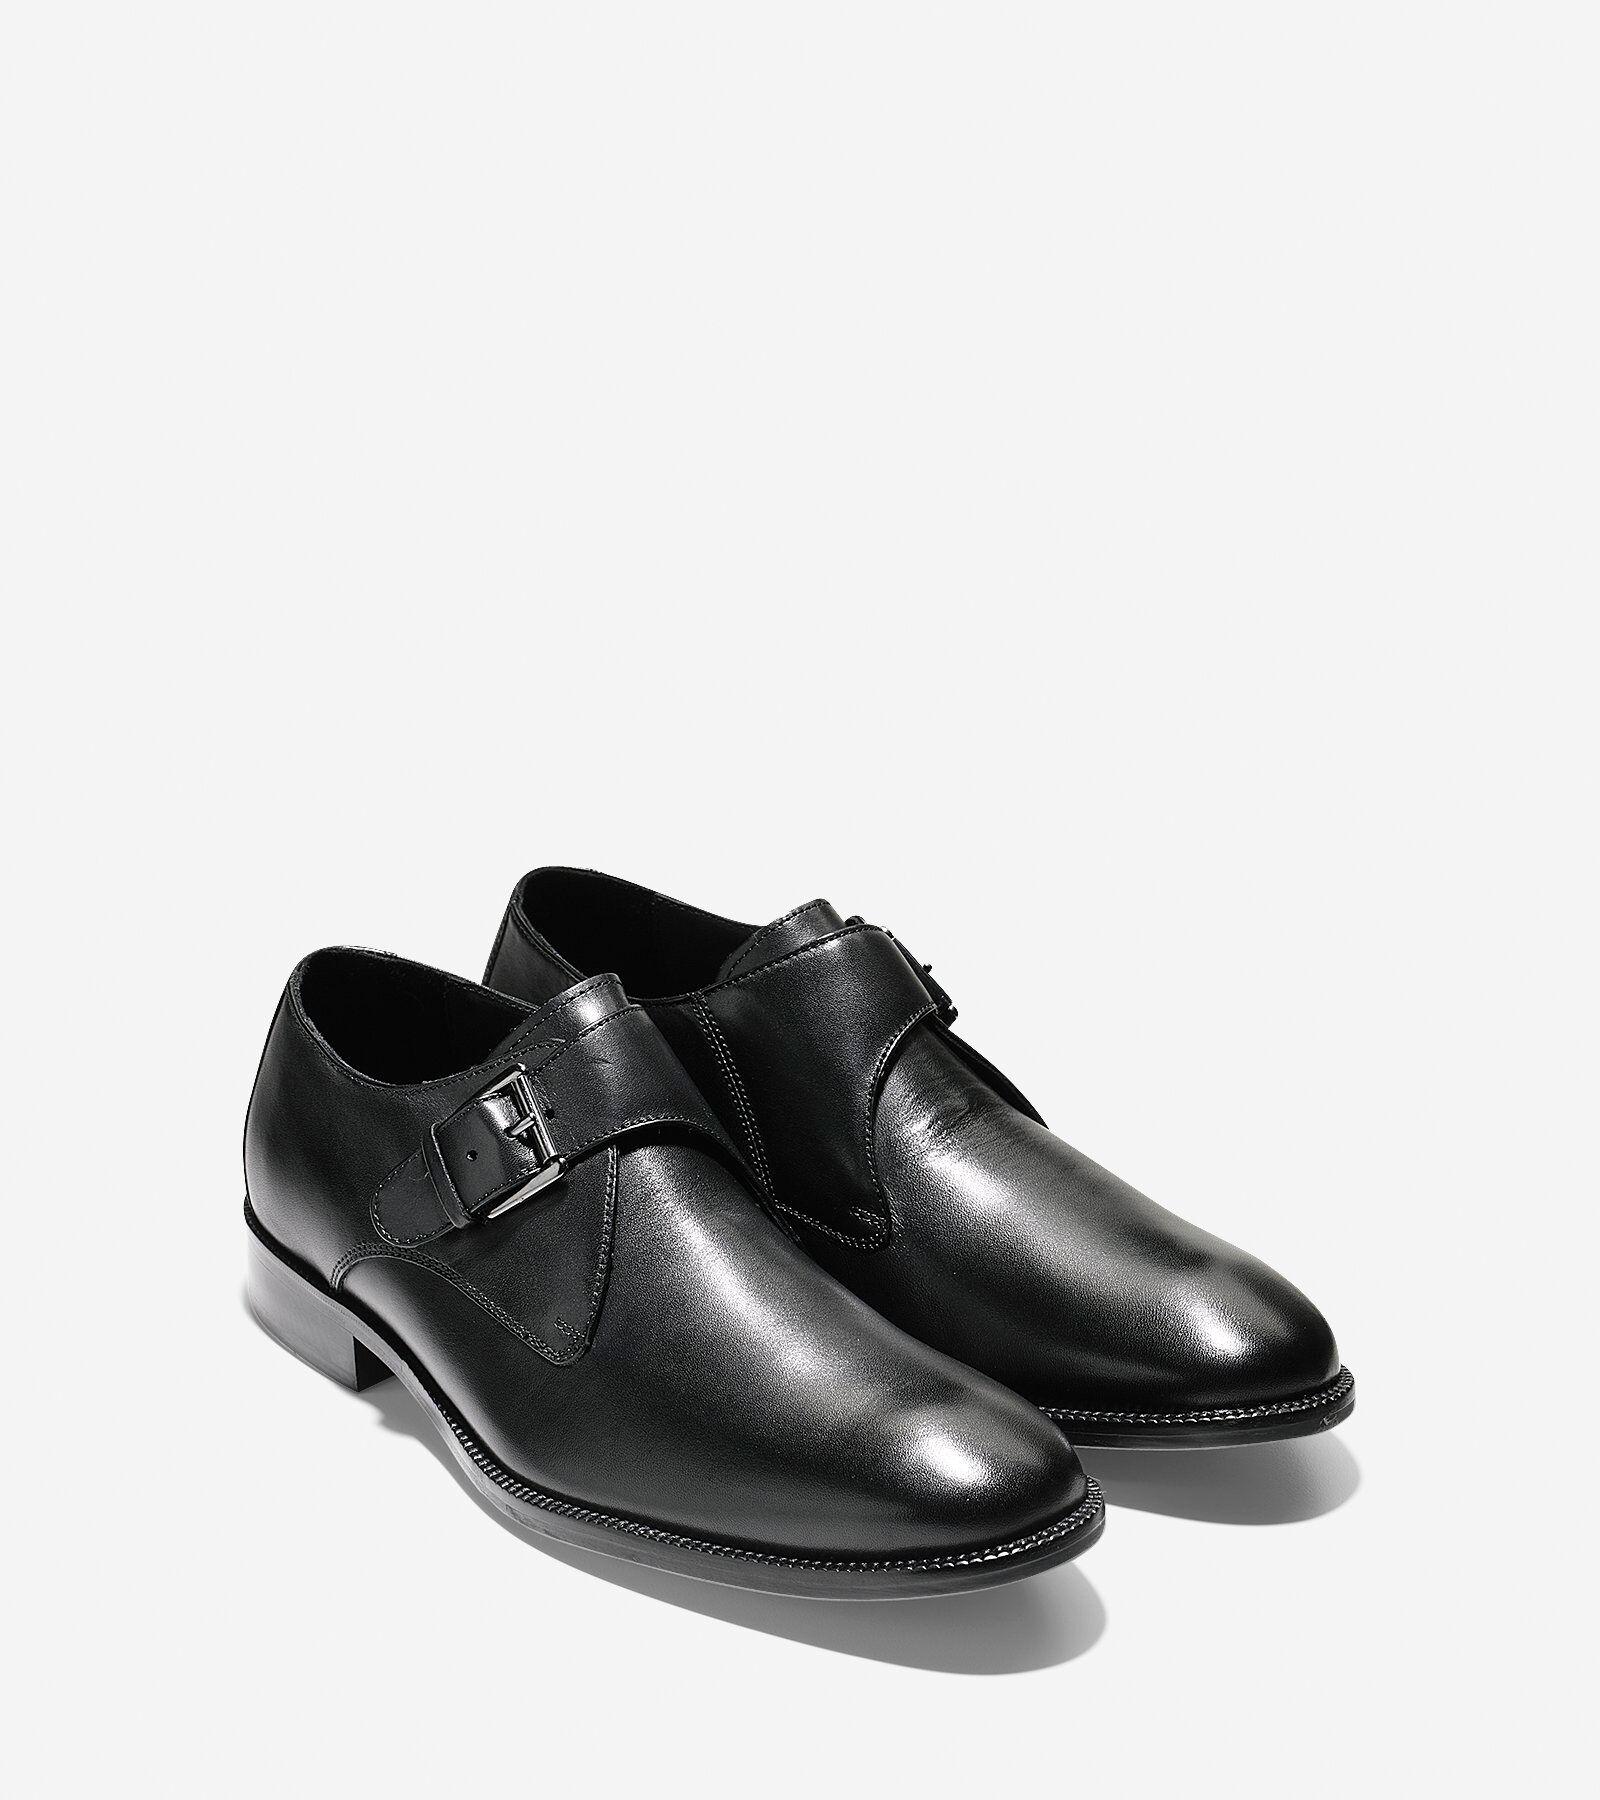 Williams Monk Strap Oxford in Black